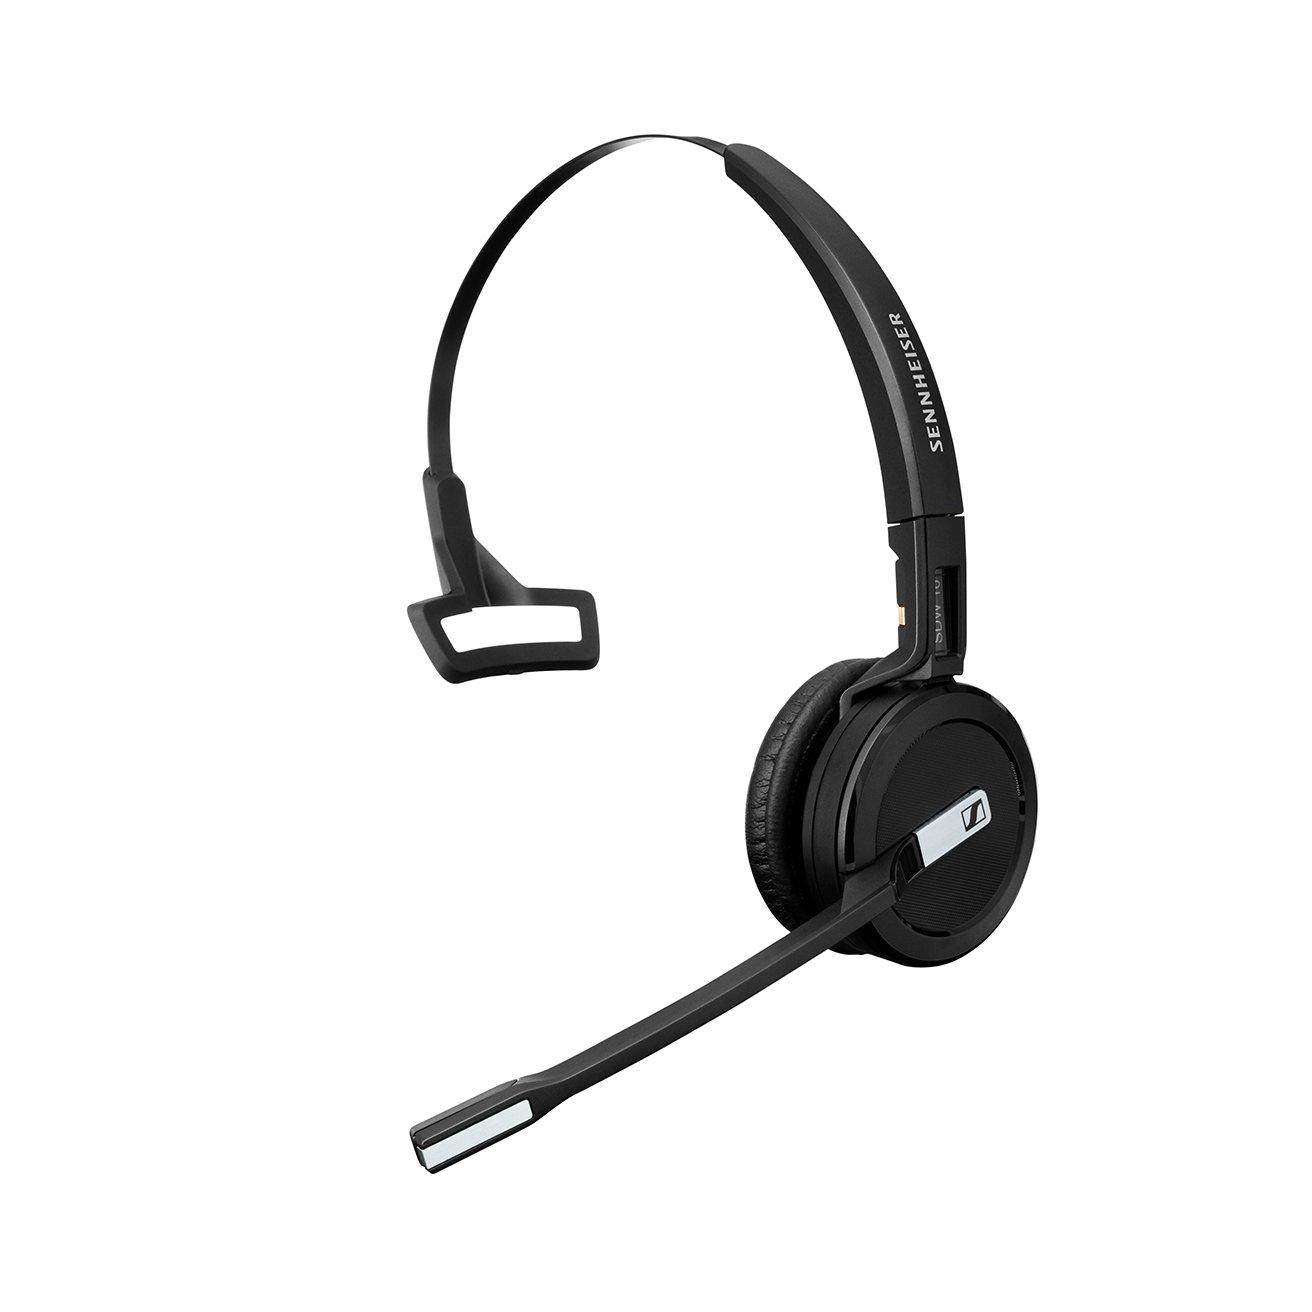 Sennheiser SDW 5016 - Headset - on-ear - convertible - DECT - wireless